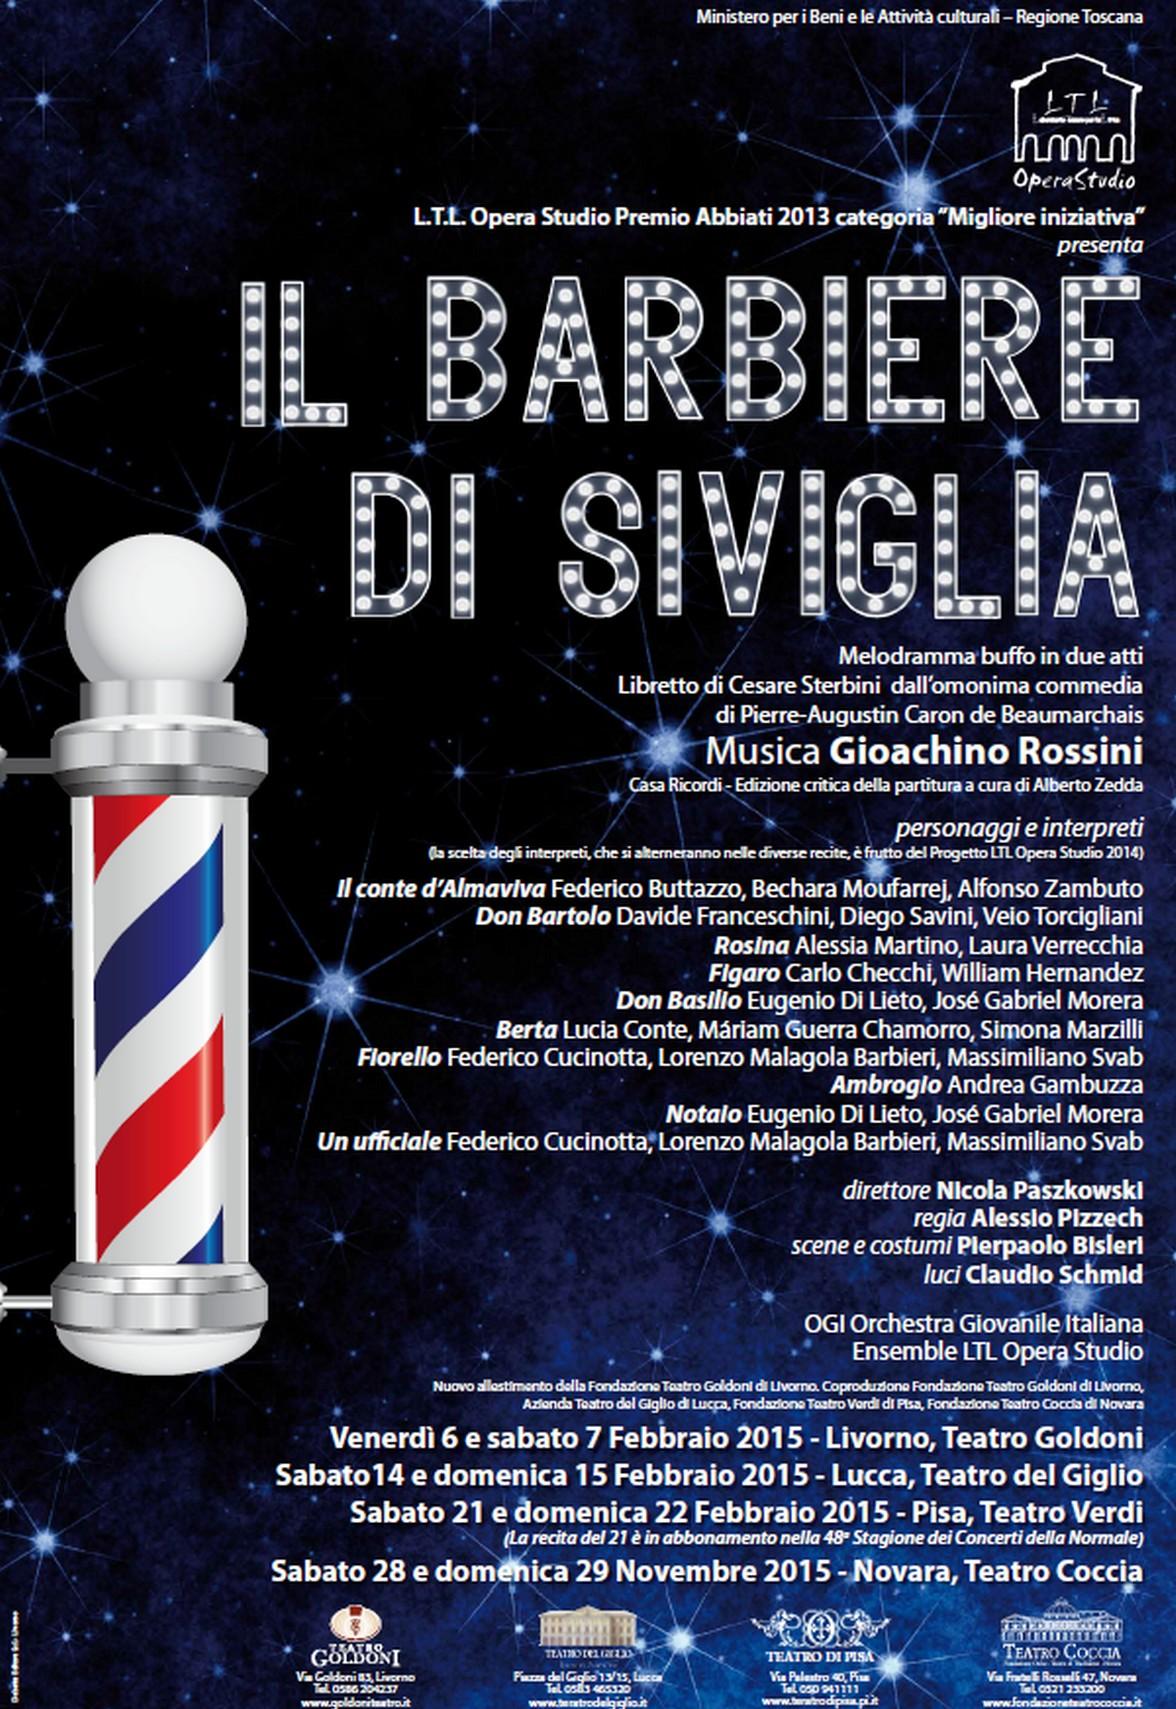 Manifesto barbiere